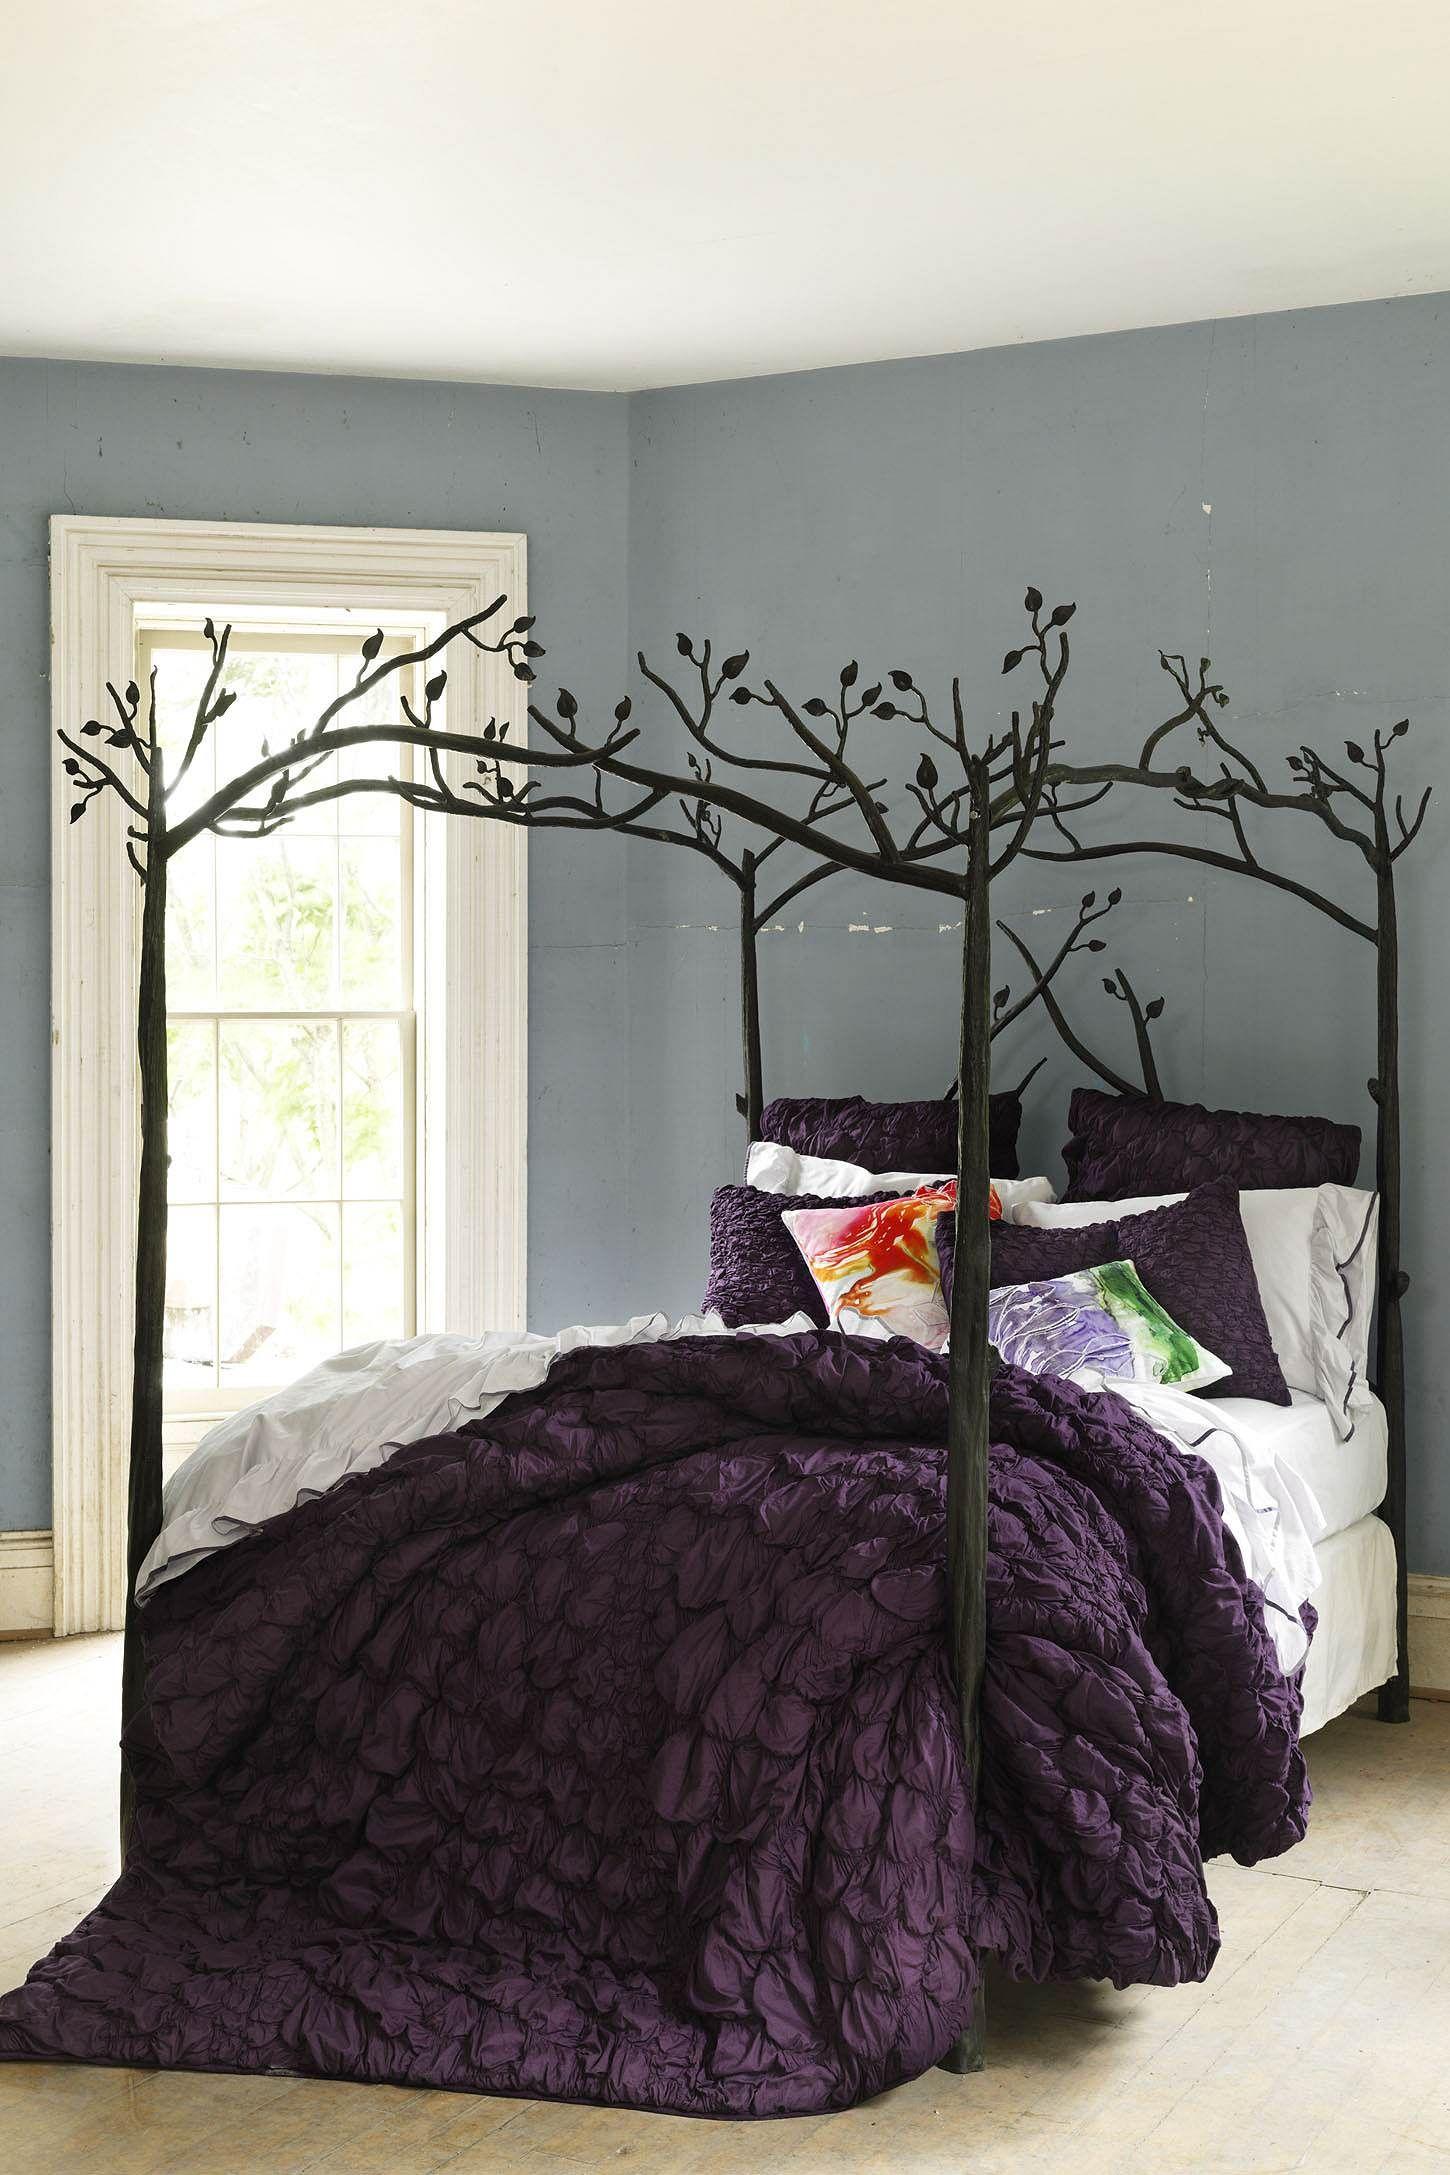 Catalina Quilt, Plum Home, Plum bedding, My home design